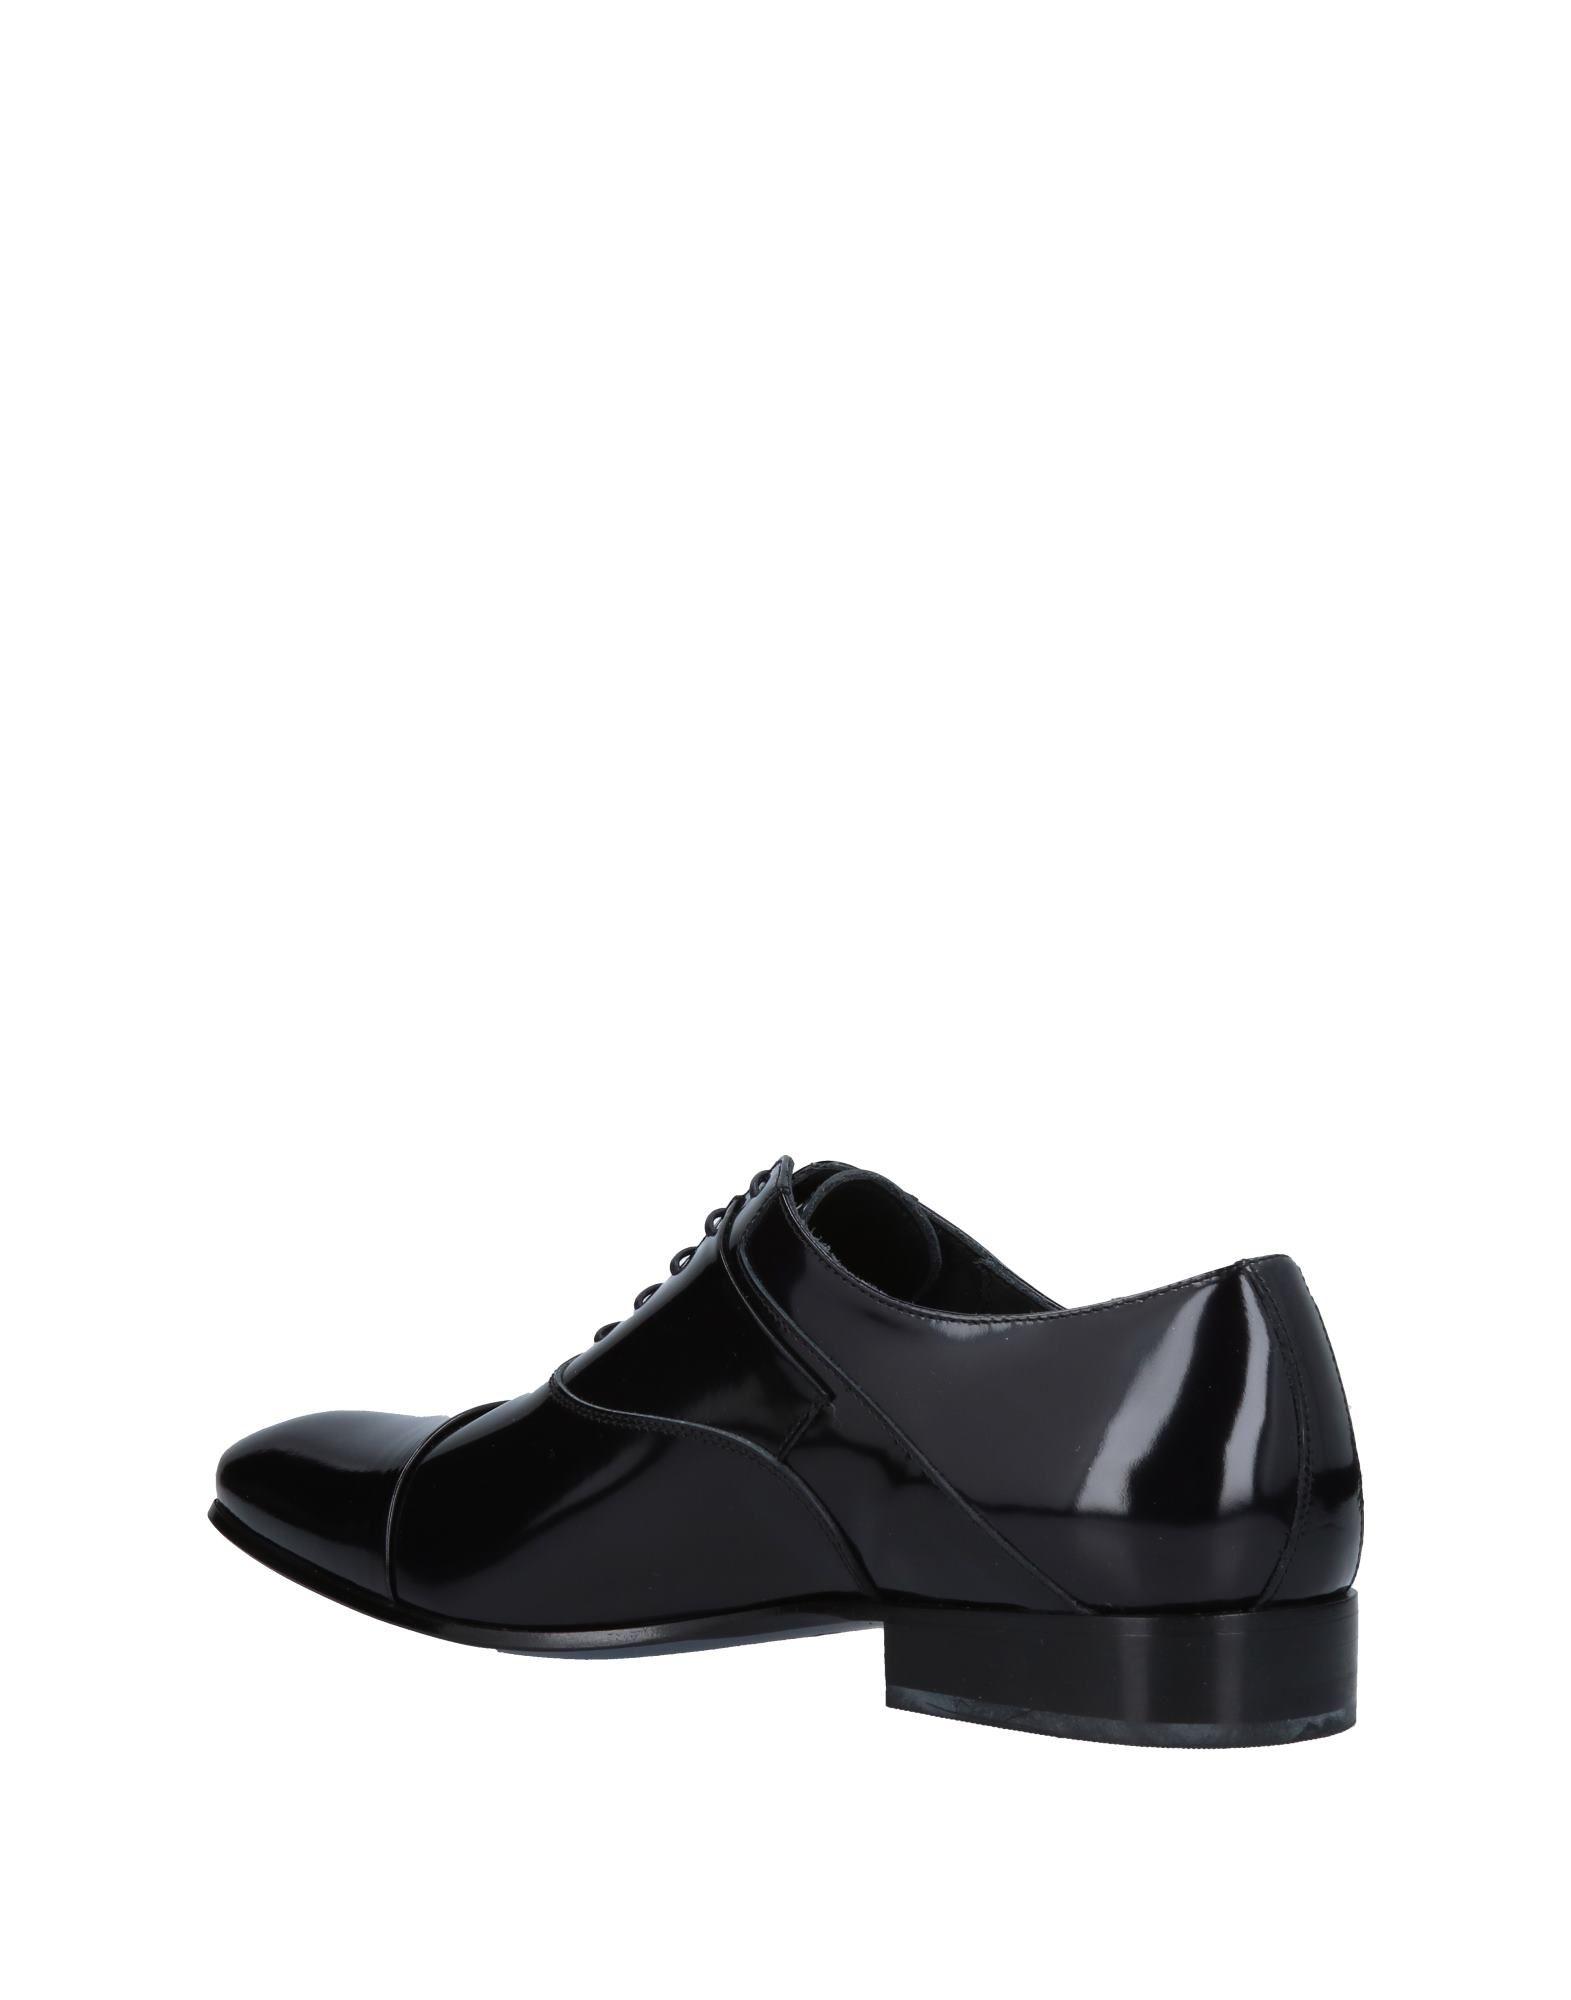 Giovanni Conti Schnürschuhe Schuhe Herren  11412554ER Neue Schuhe Schnürschuhe f2643d